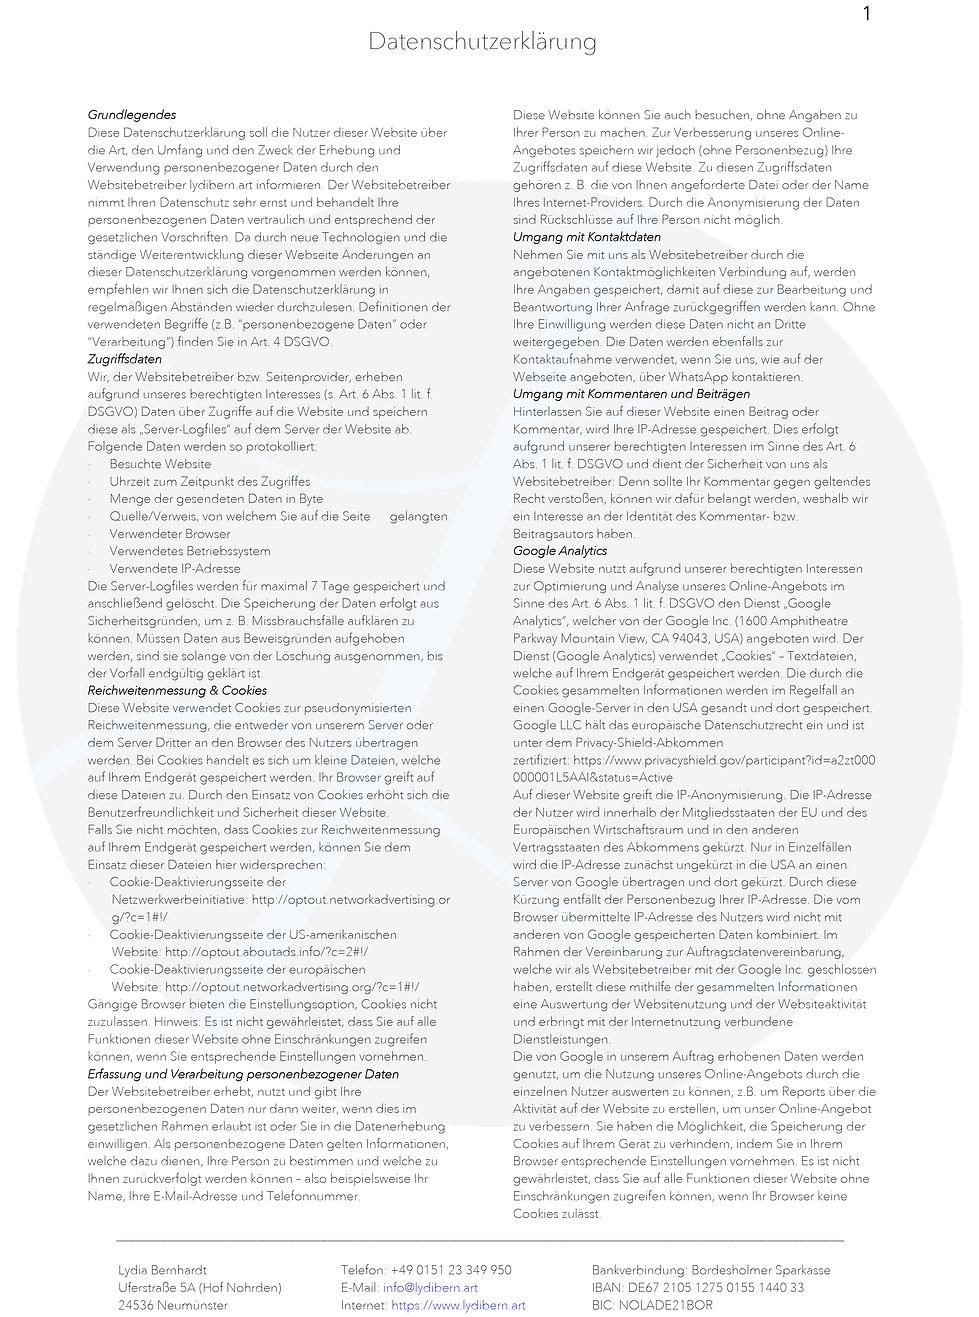 Datenschutzerklärung-1.jpg